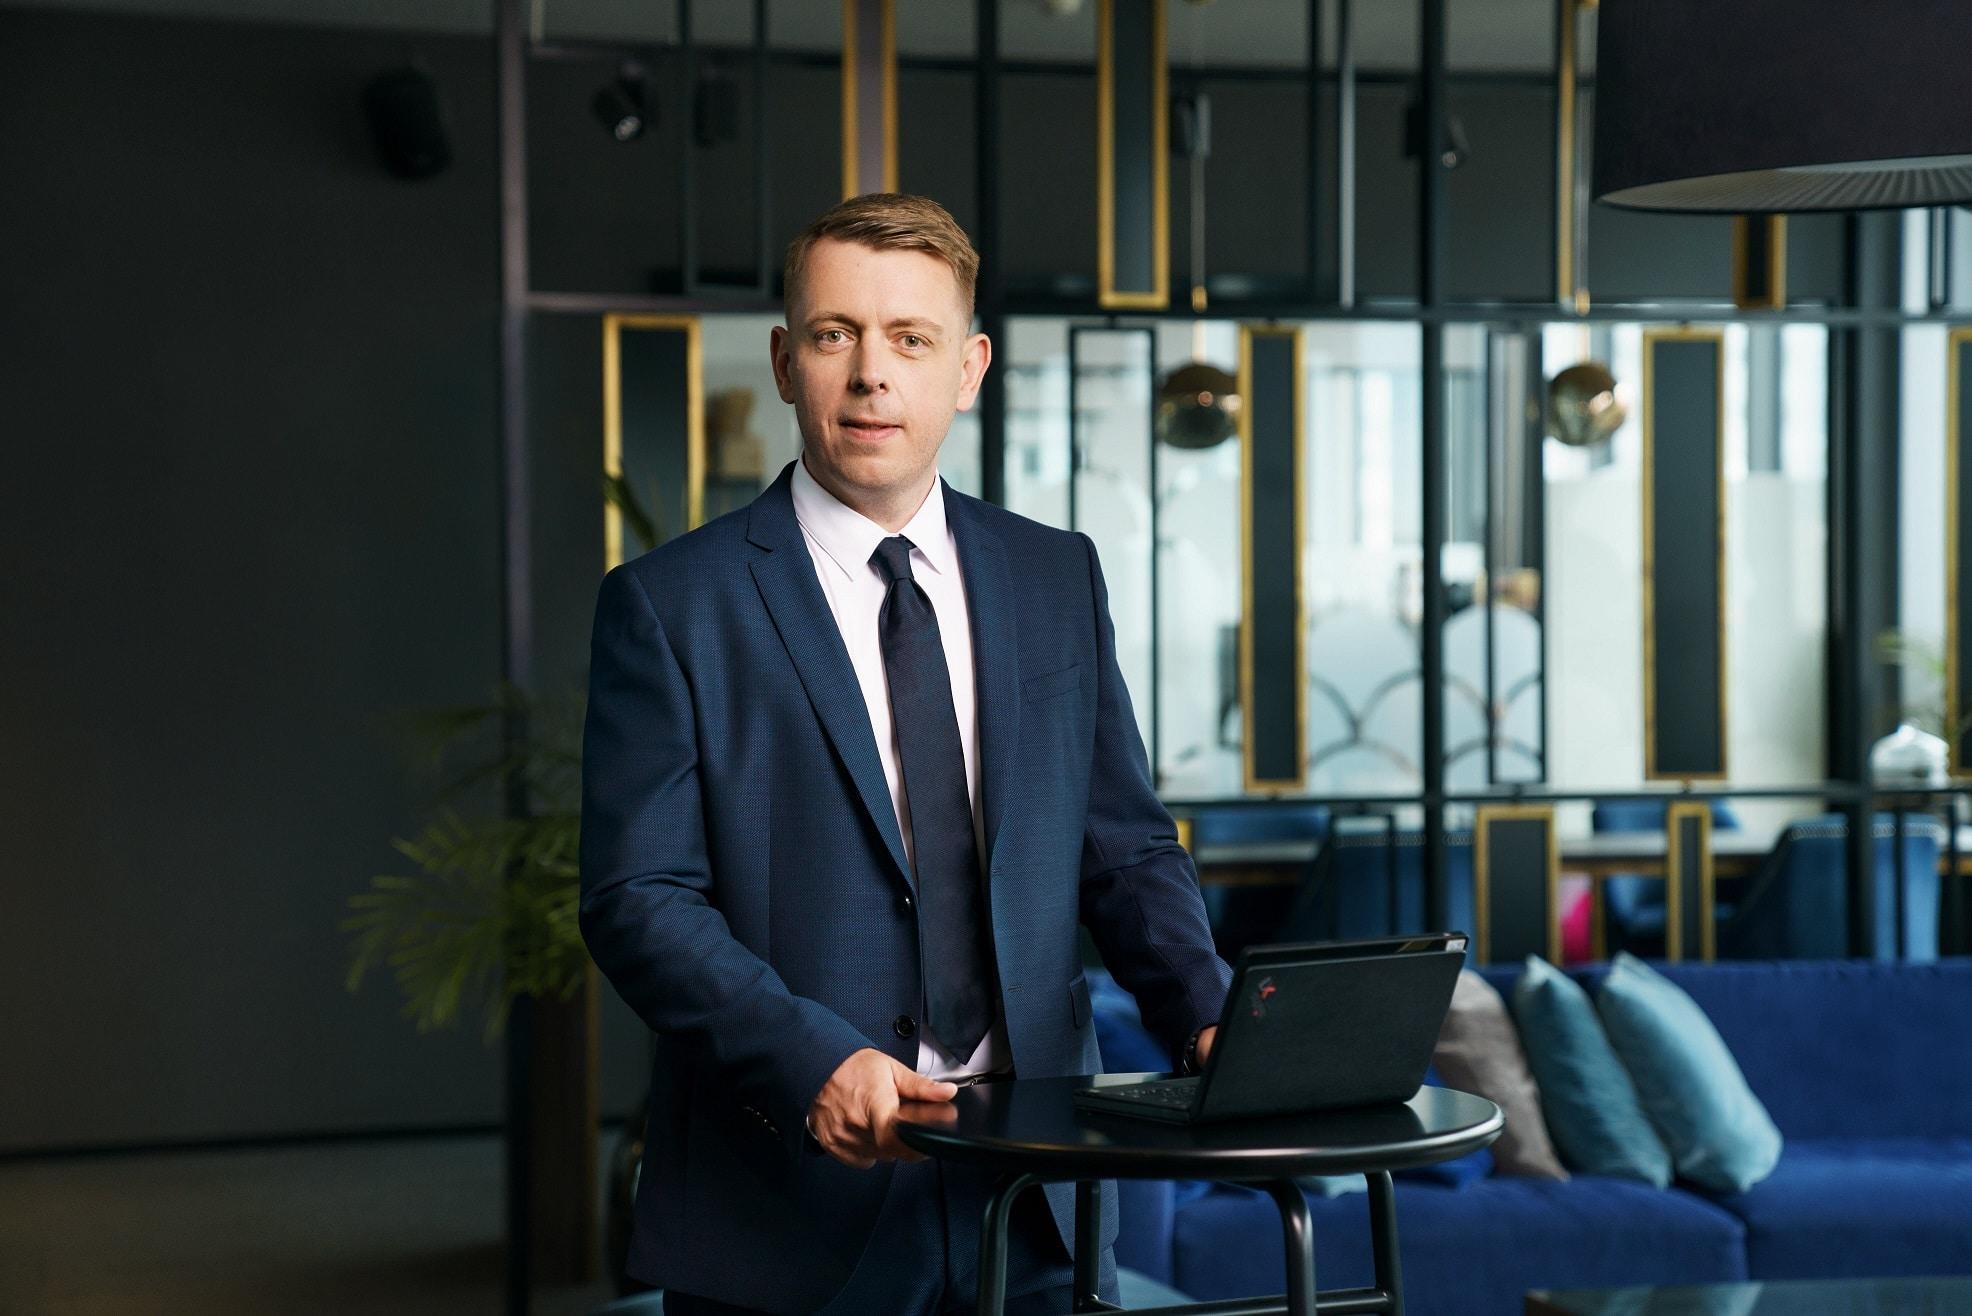 Tomasz Klewinowski, SMB Segment Leader wLenovo Polska